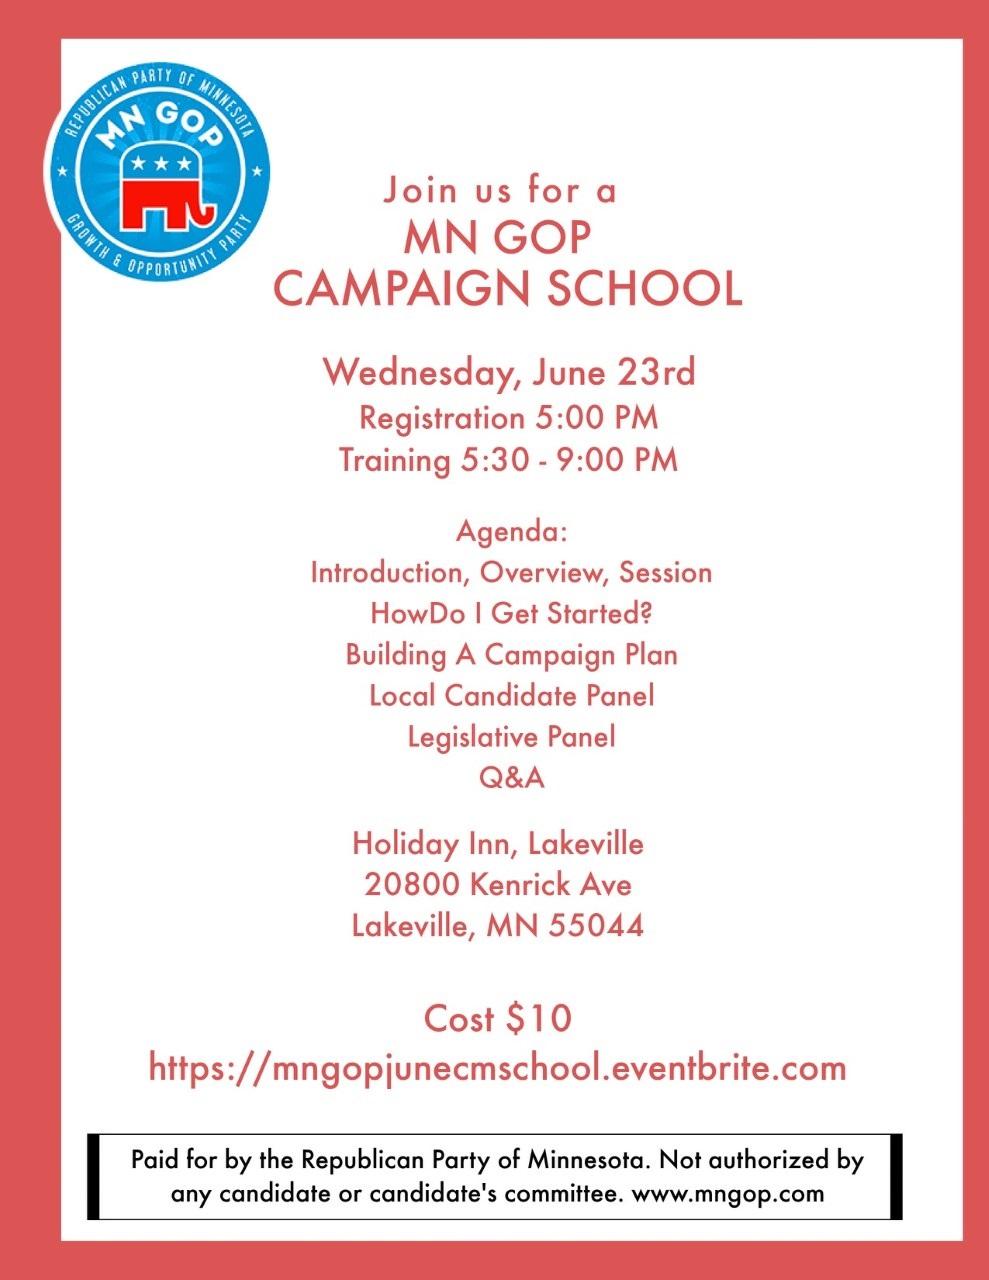 MN_GOP_Campaign_School.jpg